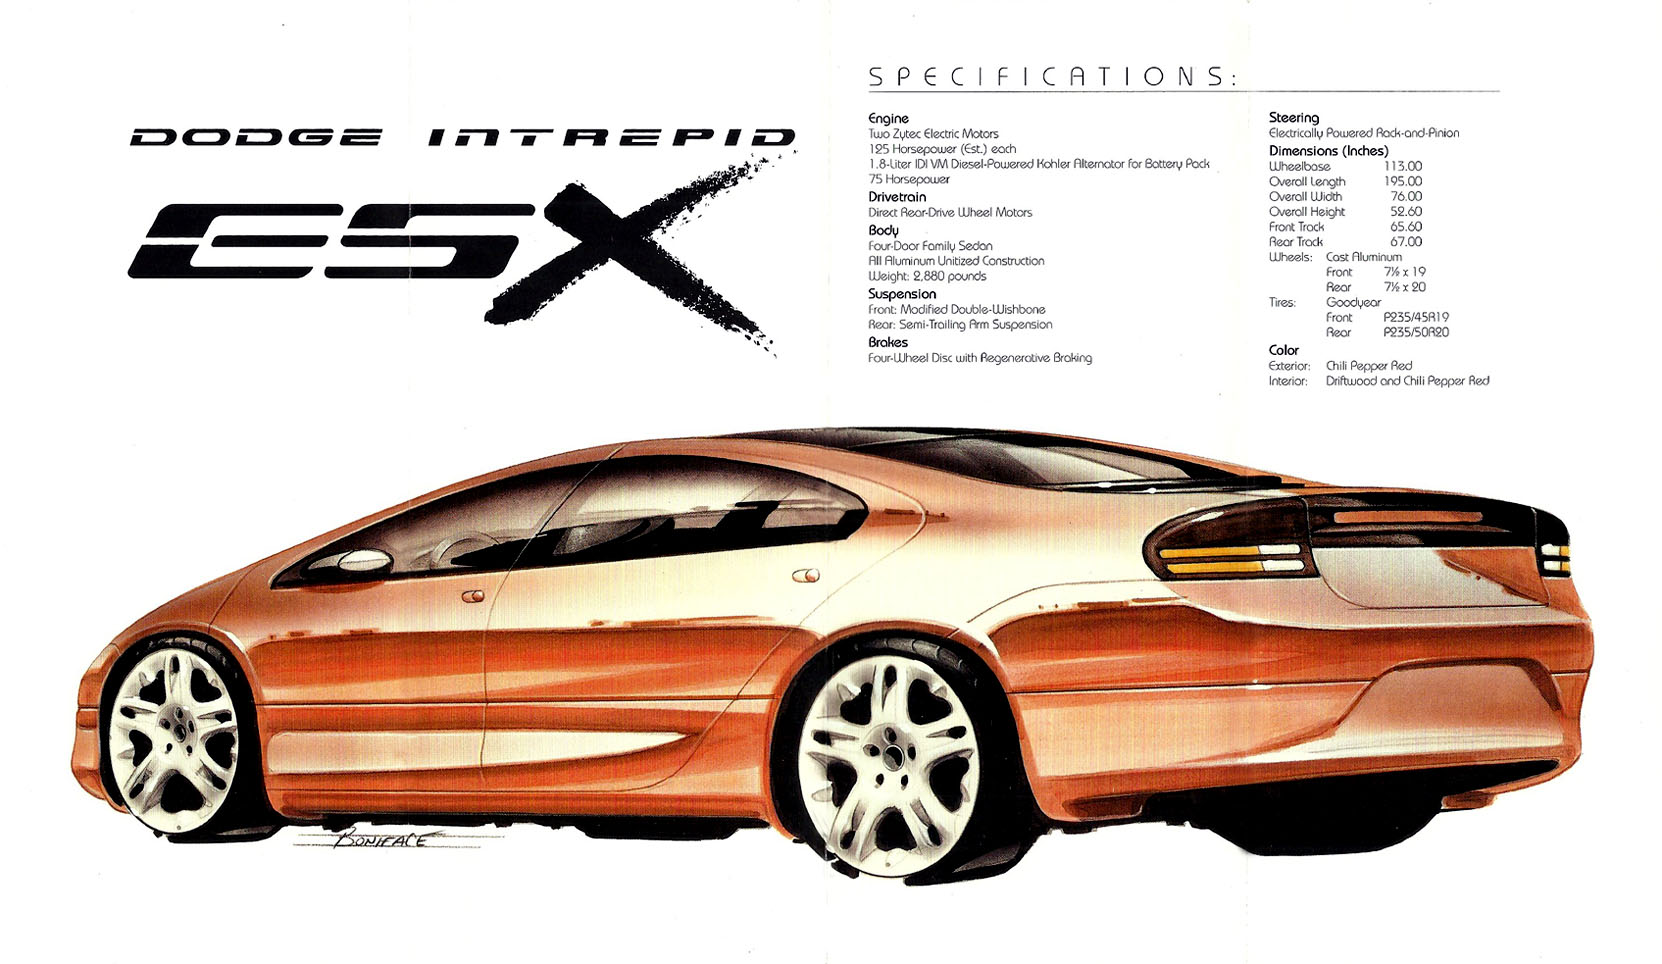 hight resolution of dodge intrepid esx 1996 brochure